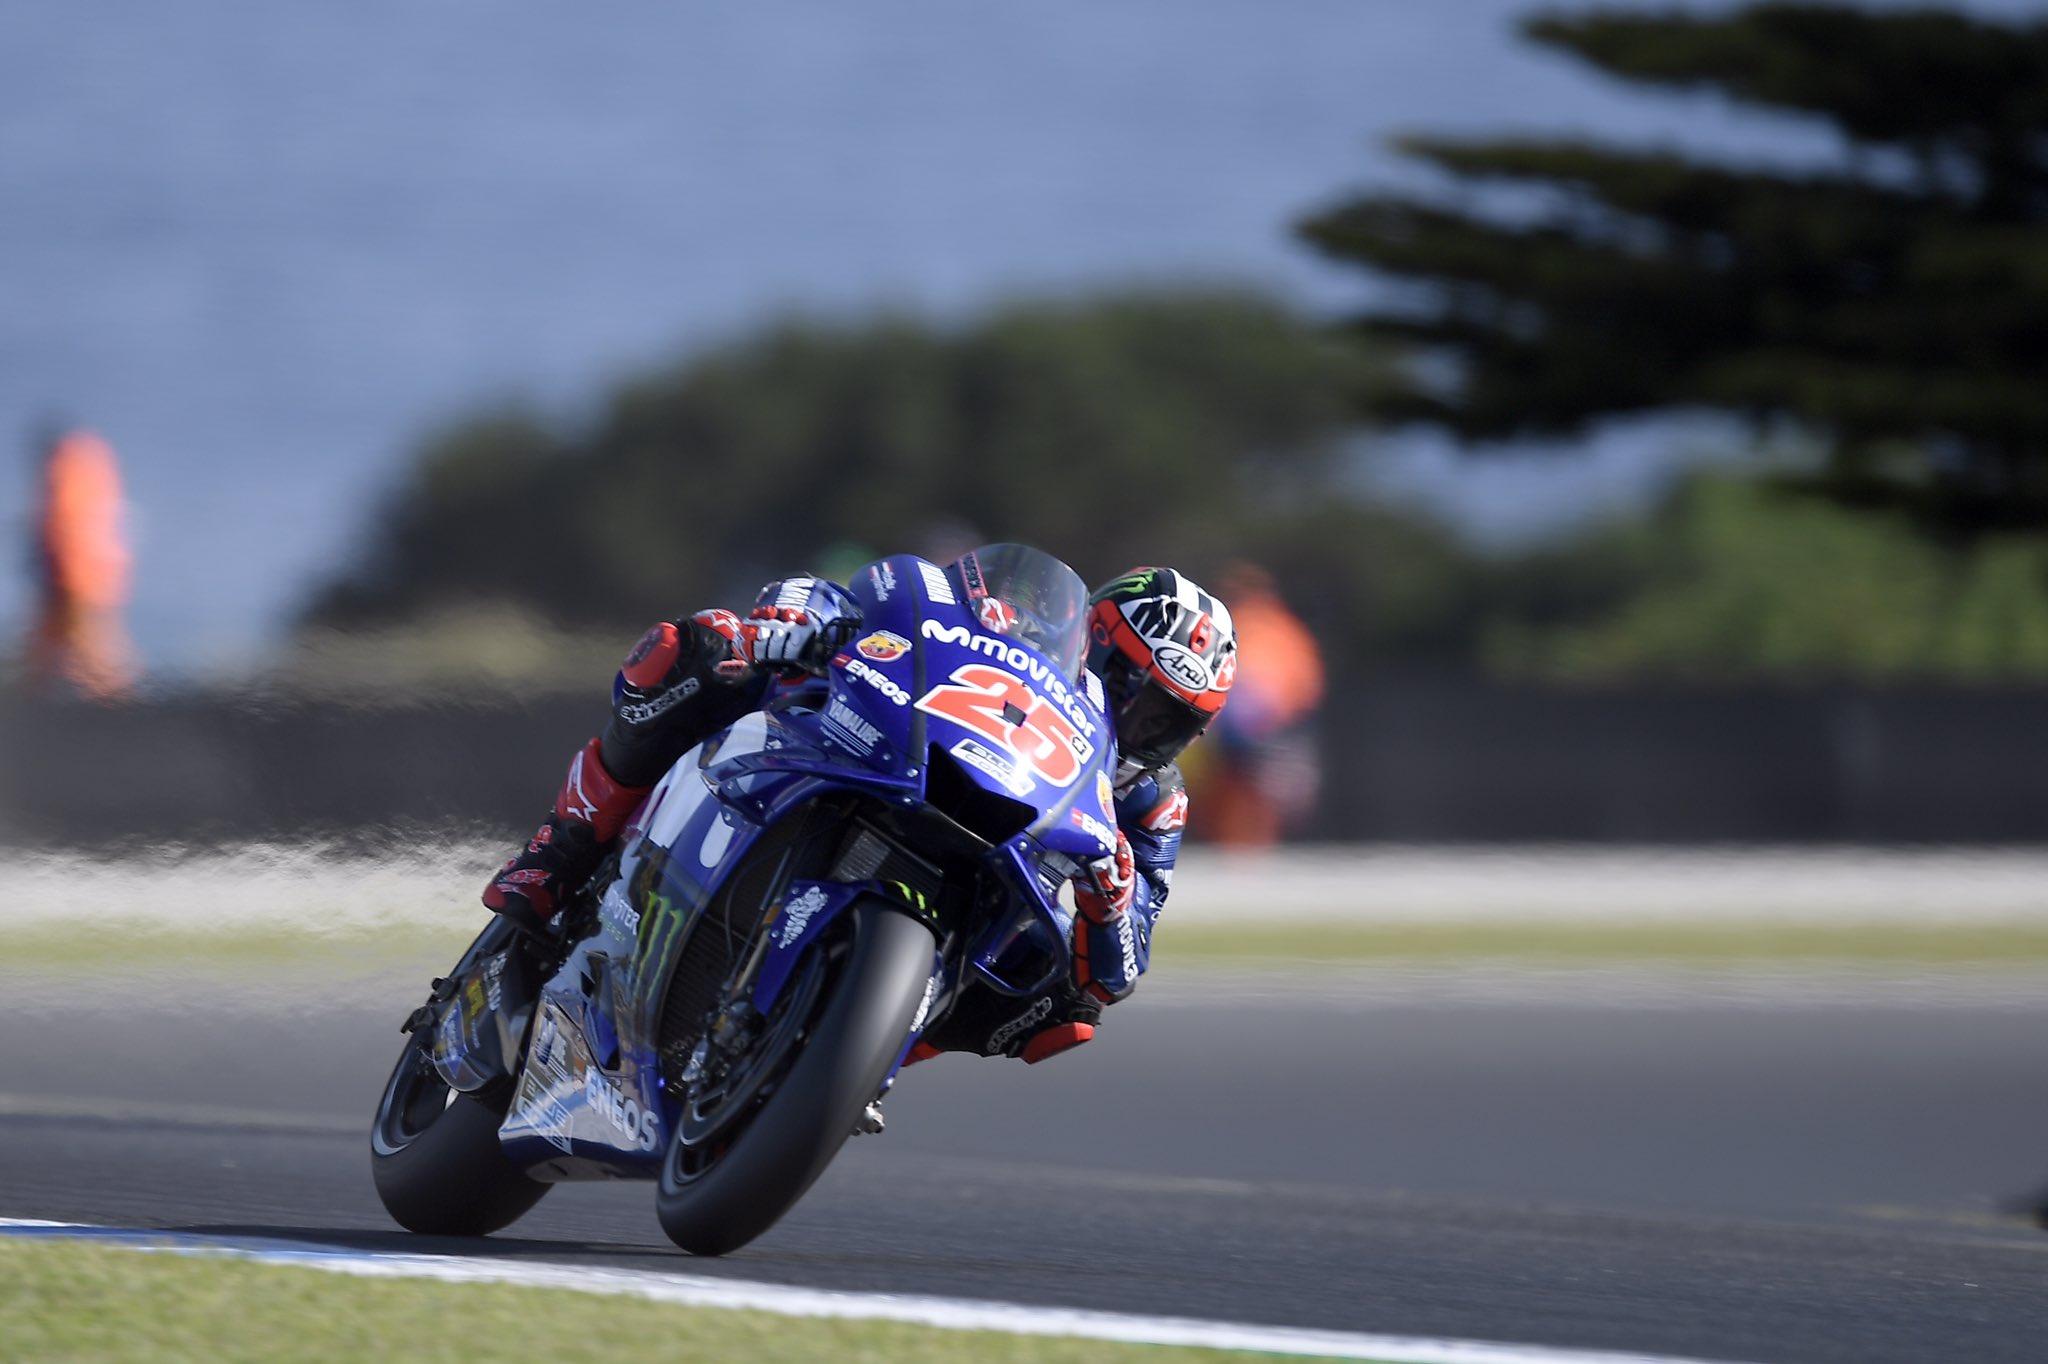 MotoGP – Viñales ends Yamaha winless streak with Australia win